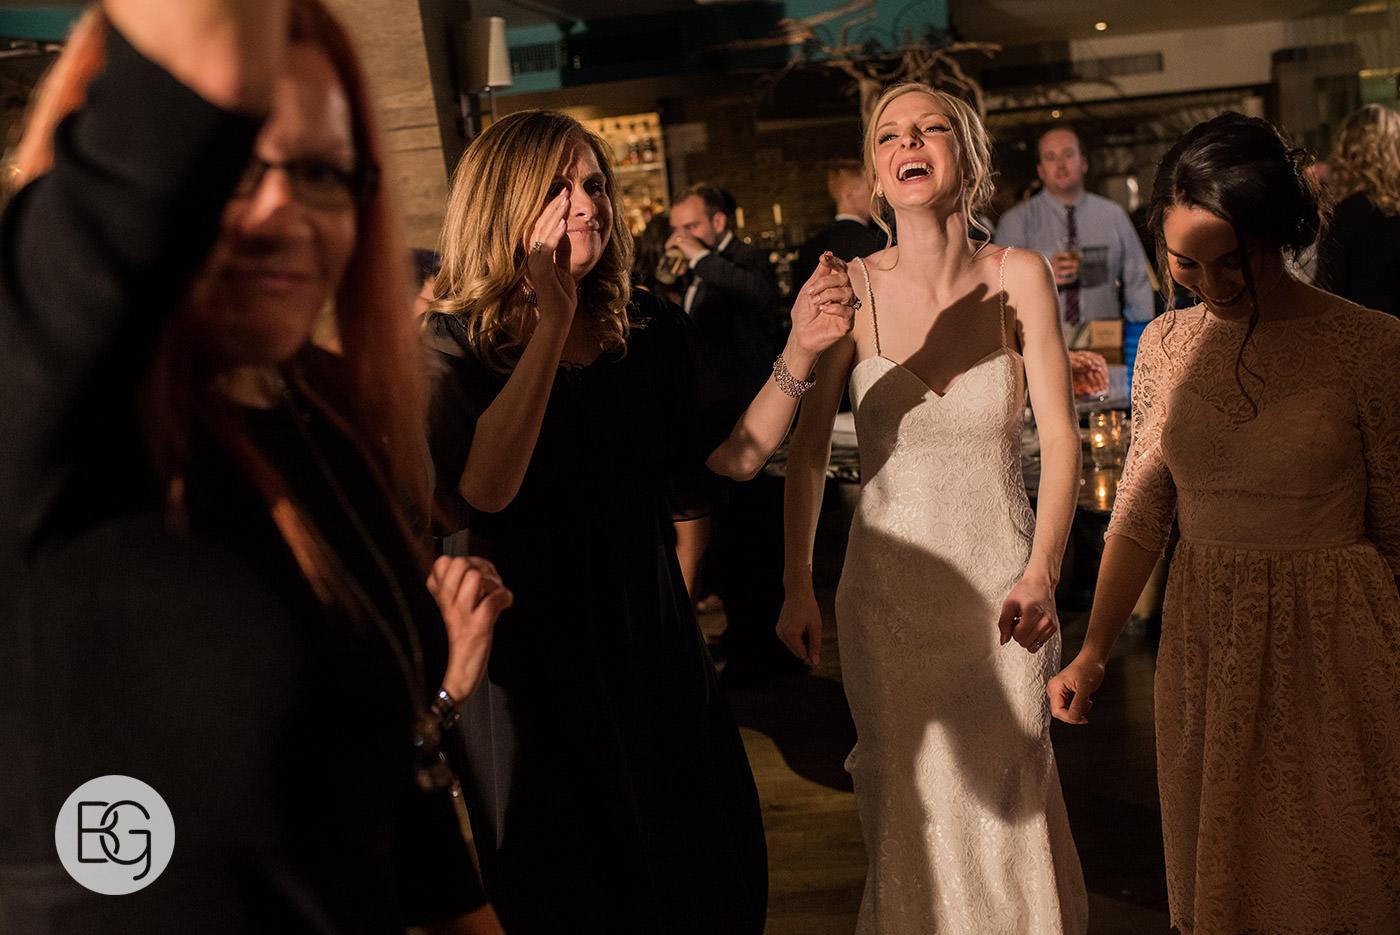 Edmonton_wedding_photographers_josh_sara_whyte_50.jpg